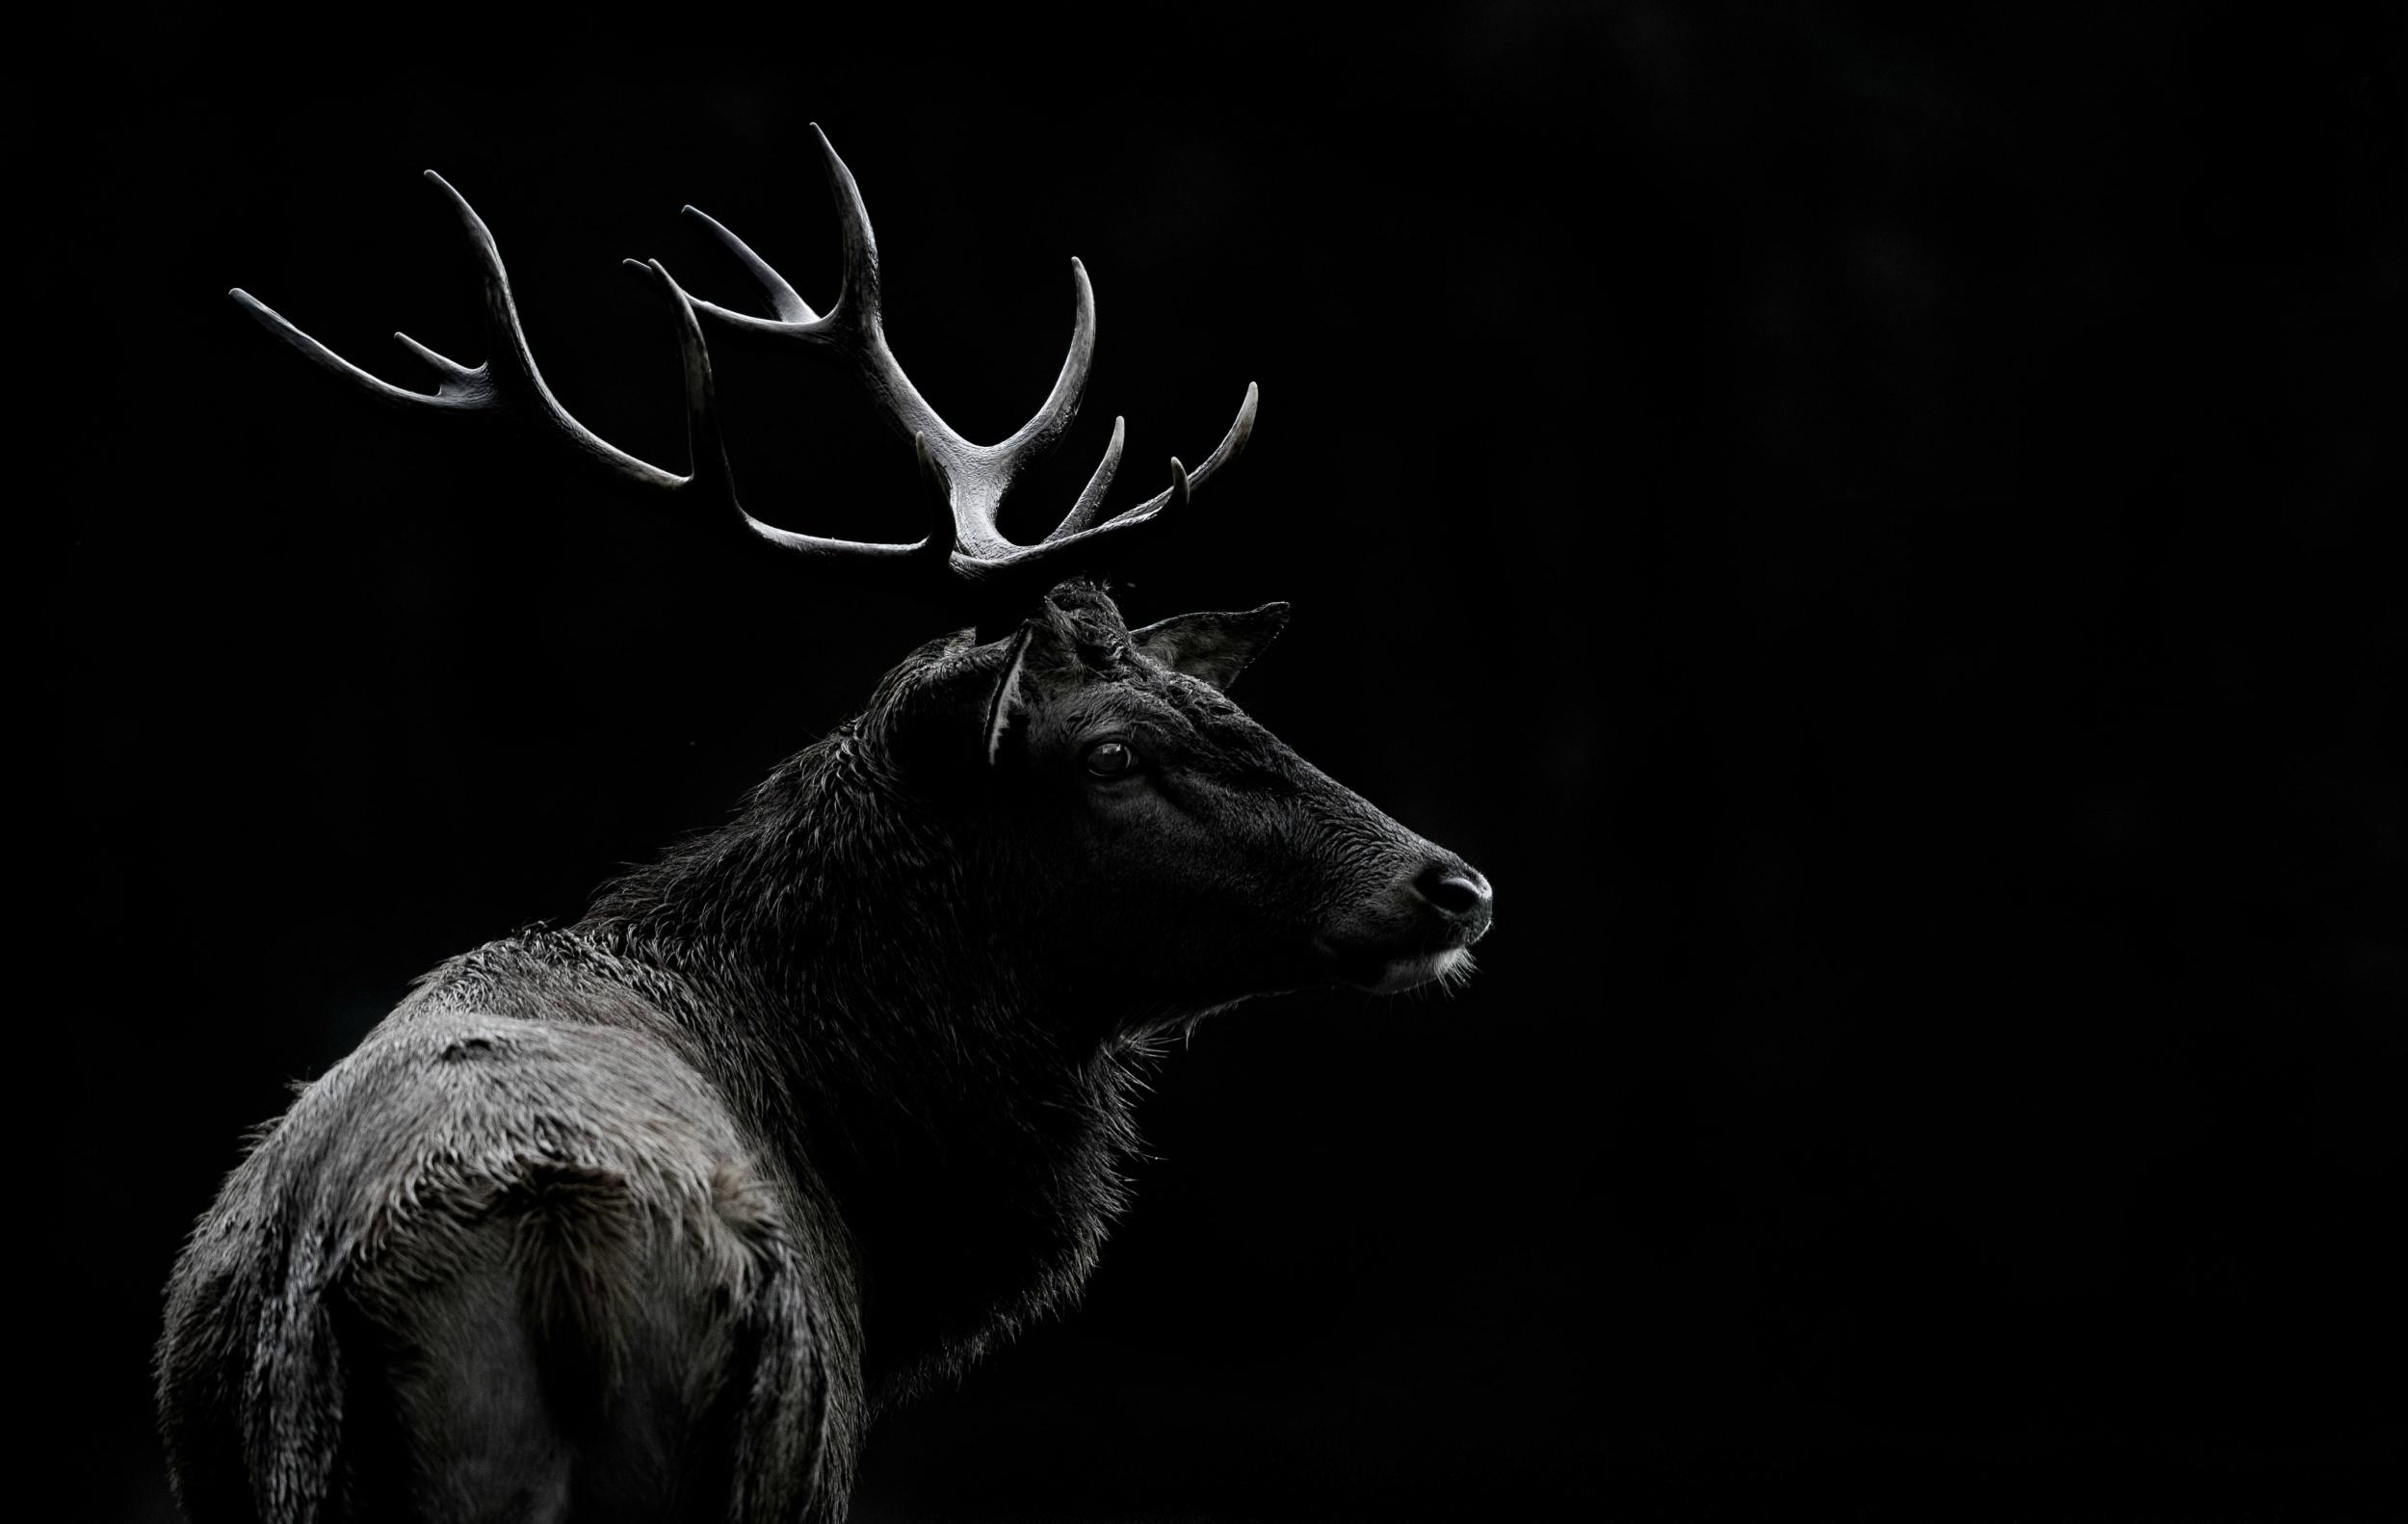 Deer hd wallpaper background image 2500x1582 id - Animal black background wallpaper ...